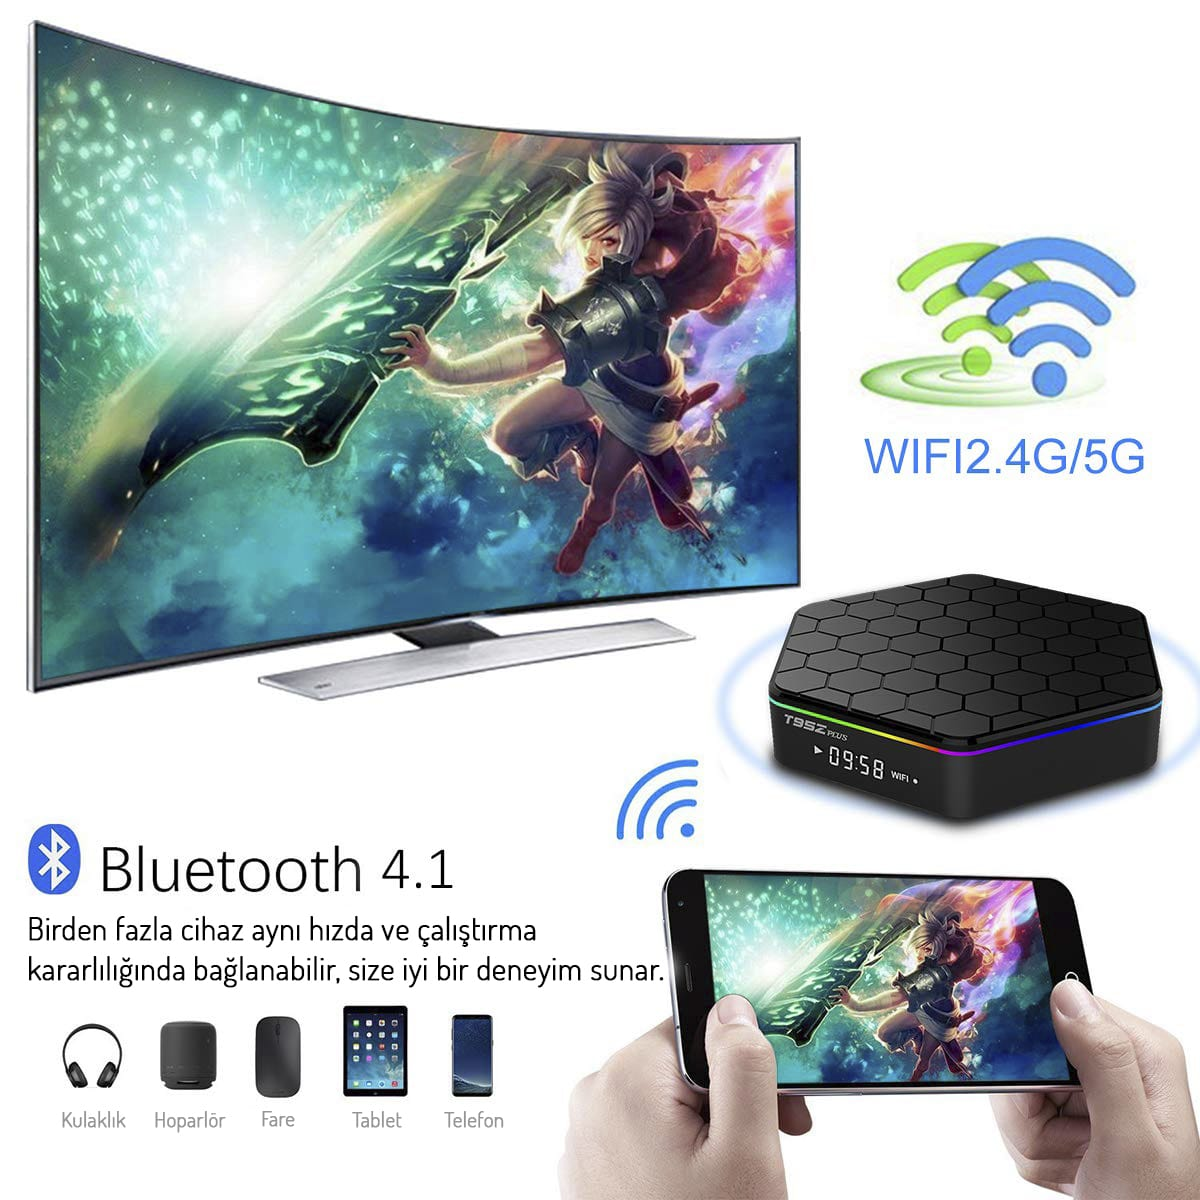 Magbox T95 ZPlus S912 2GB Ram 16GB Hafıza Dahili Wifi 4K Android Tv Box